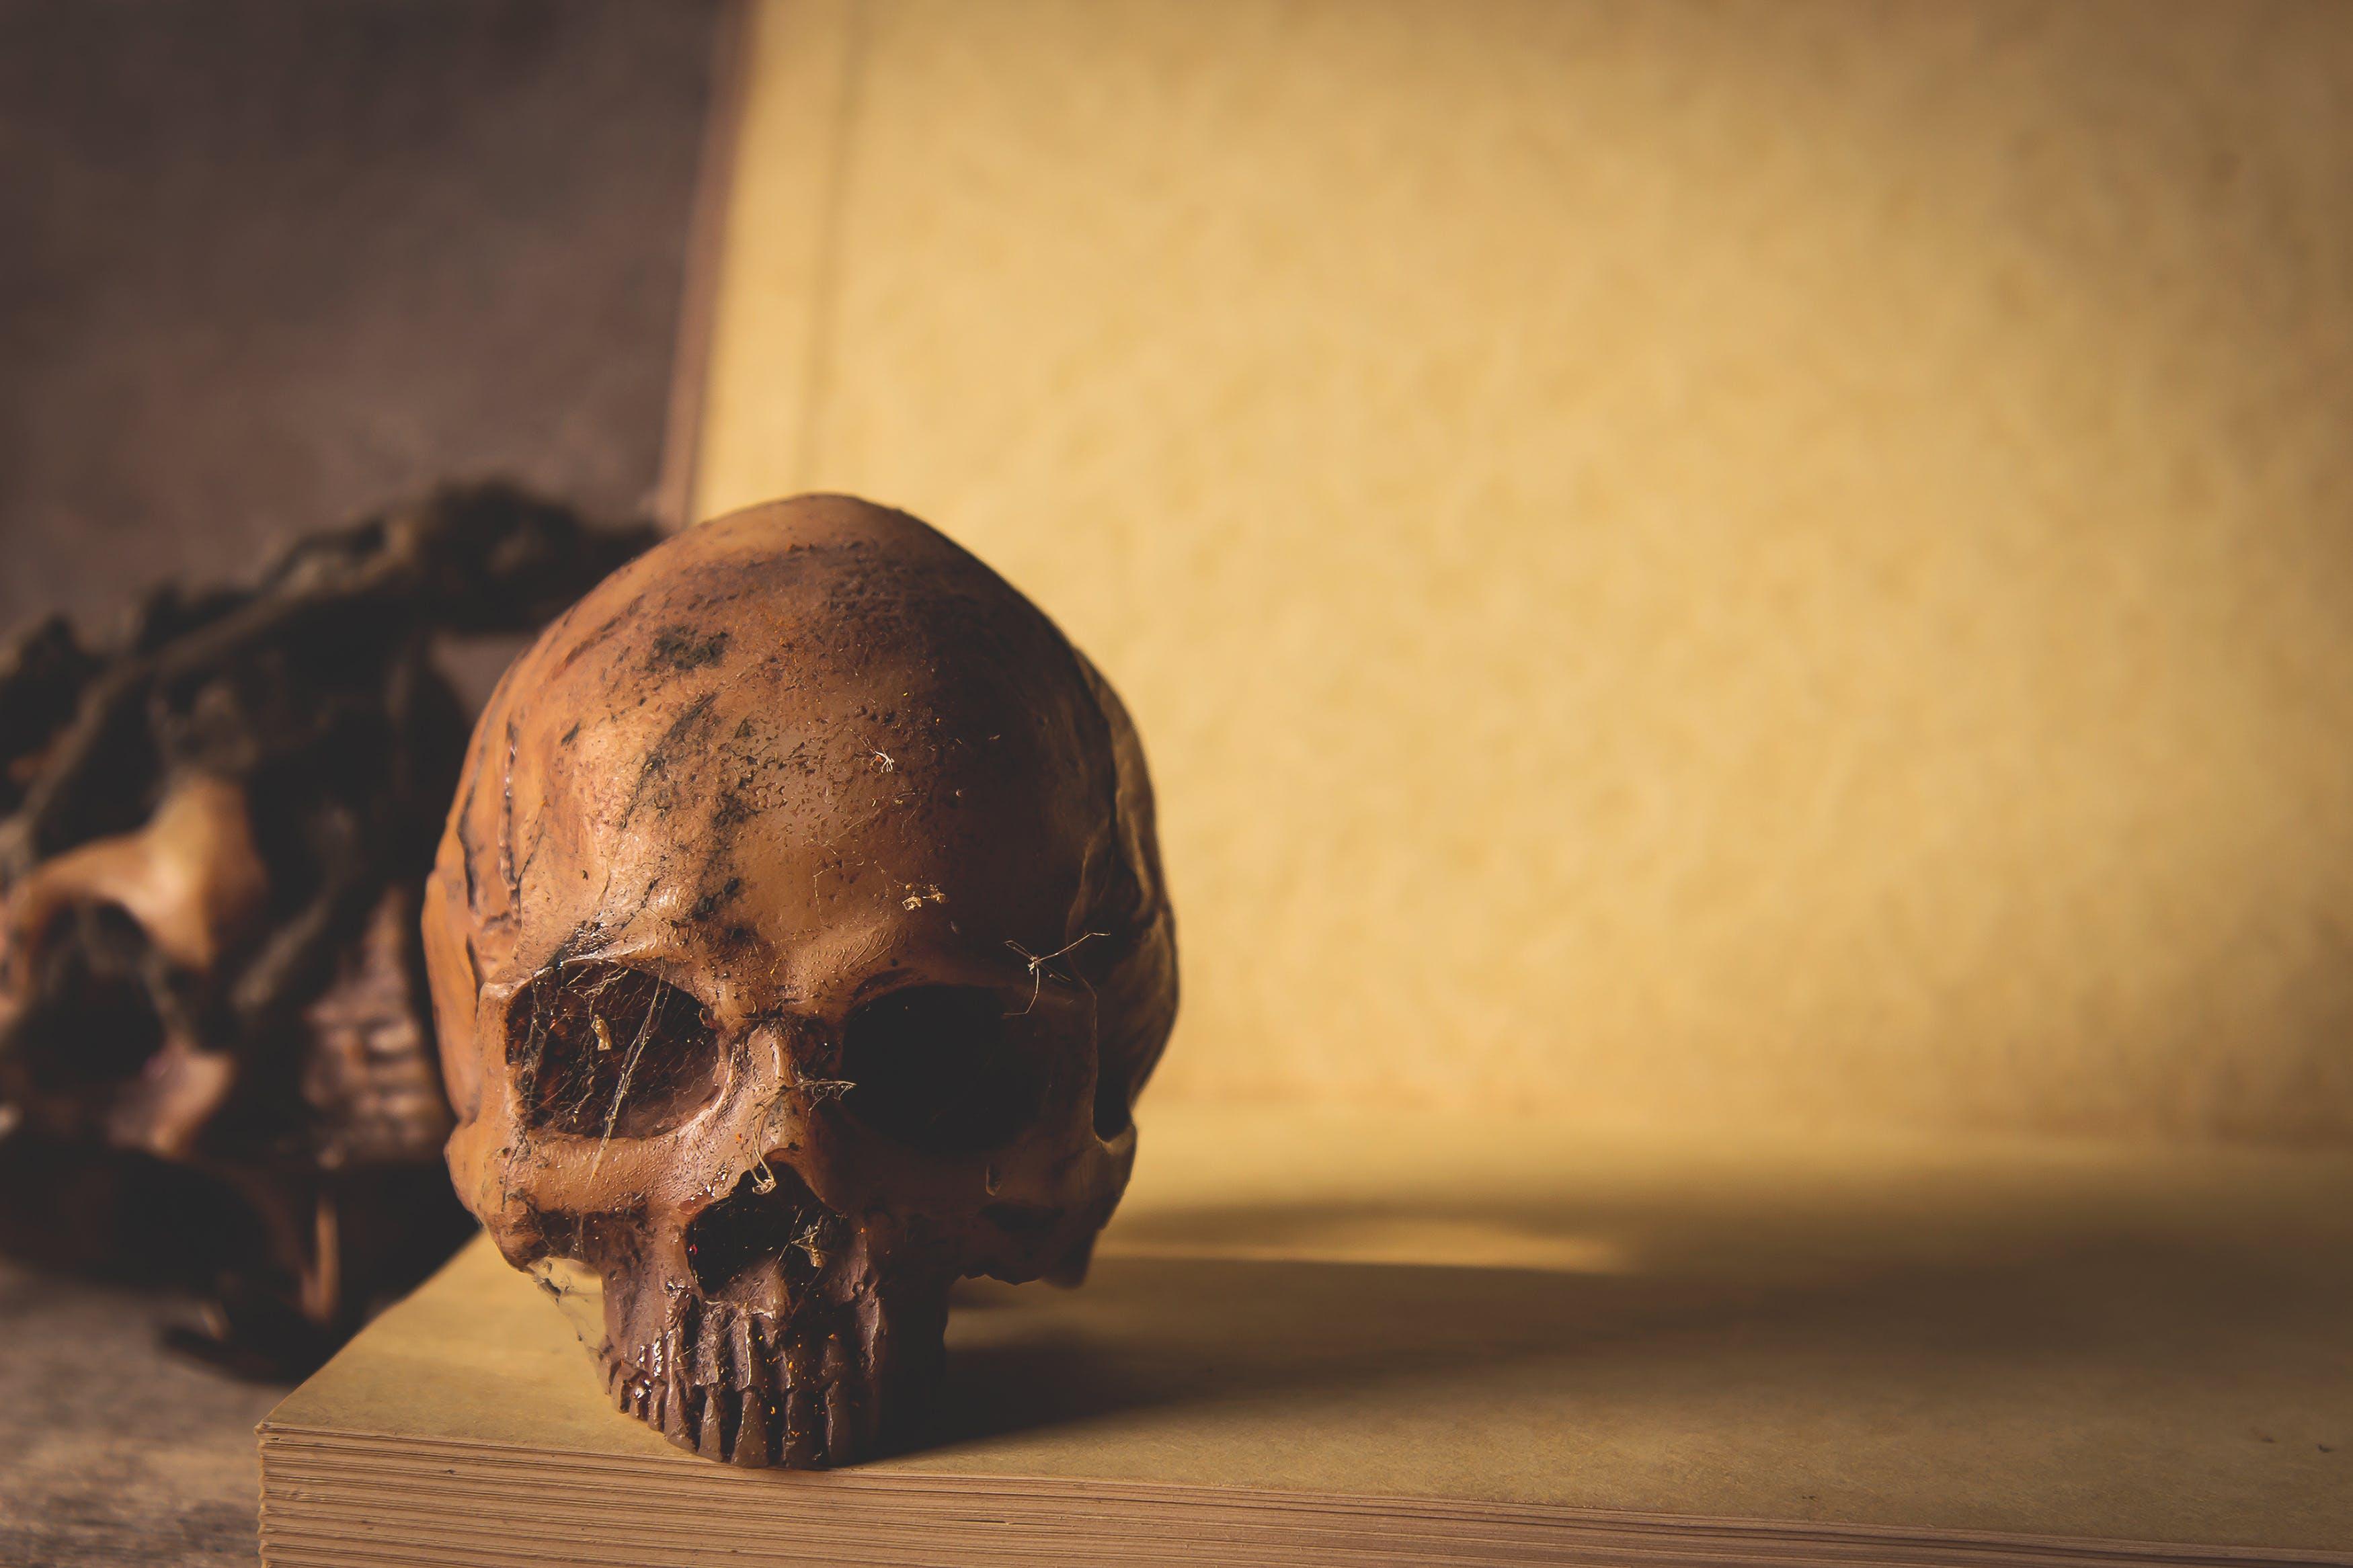 Kostenloses Stock Foto zu dunkel, fotografie, gestorben, gruselig